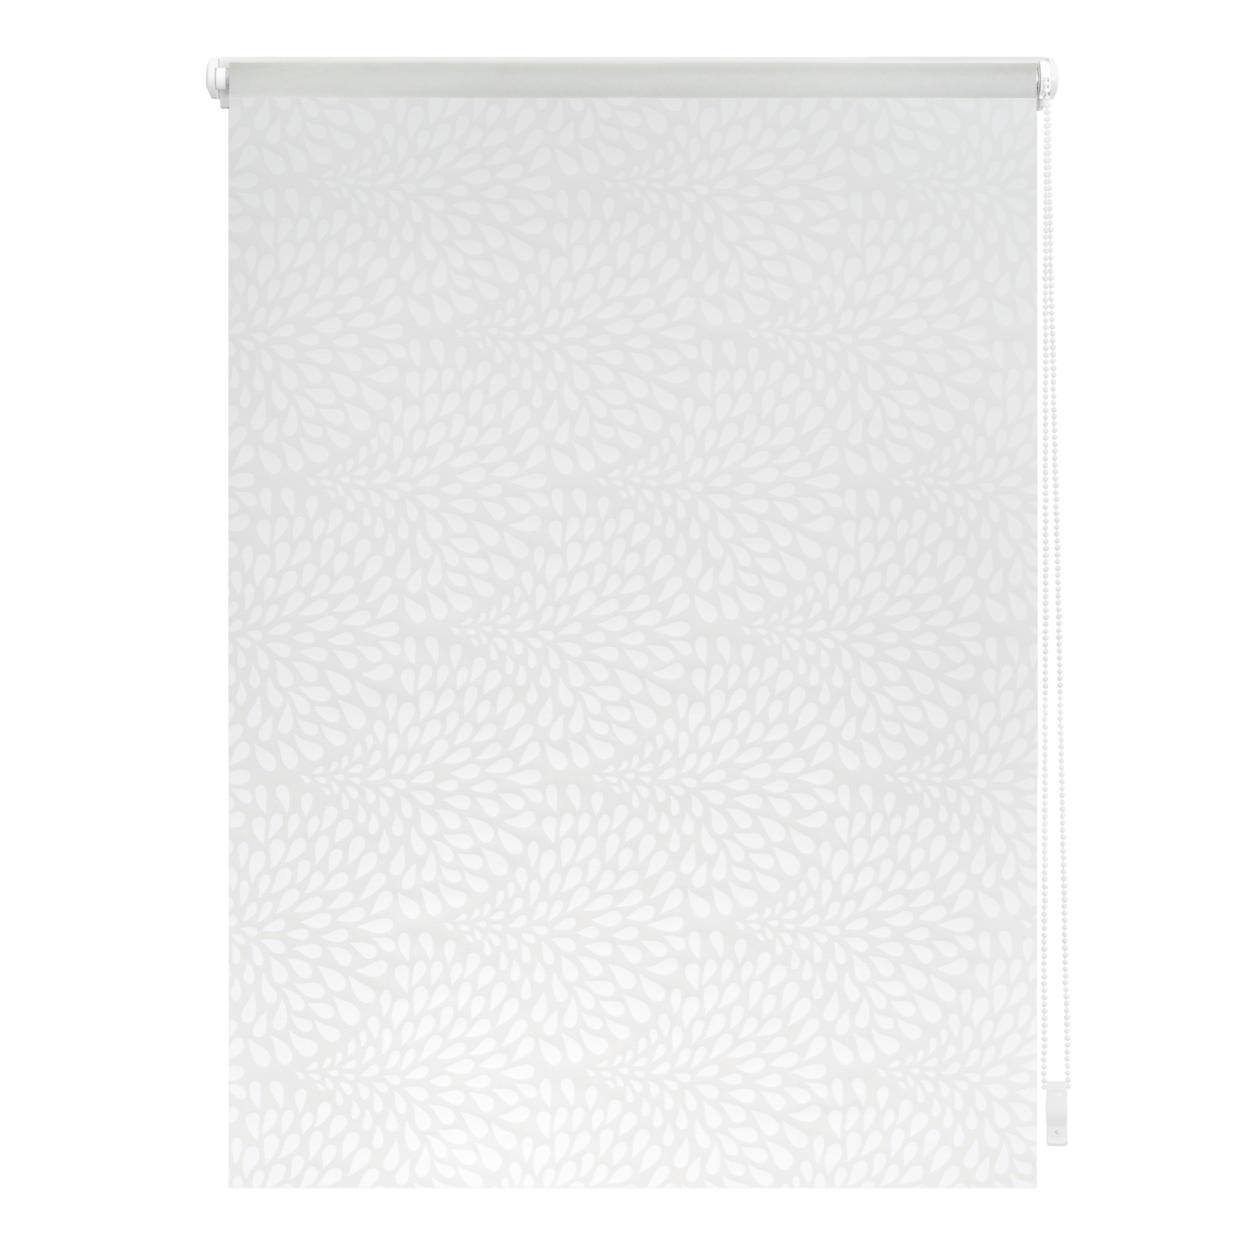 lichtblick rollo klemmfix ohne bohren blickdicht drops wei transparent mot ebay. Black Bedroom Furniture Sets. Home Design Ideas